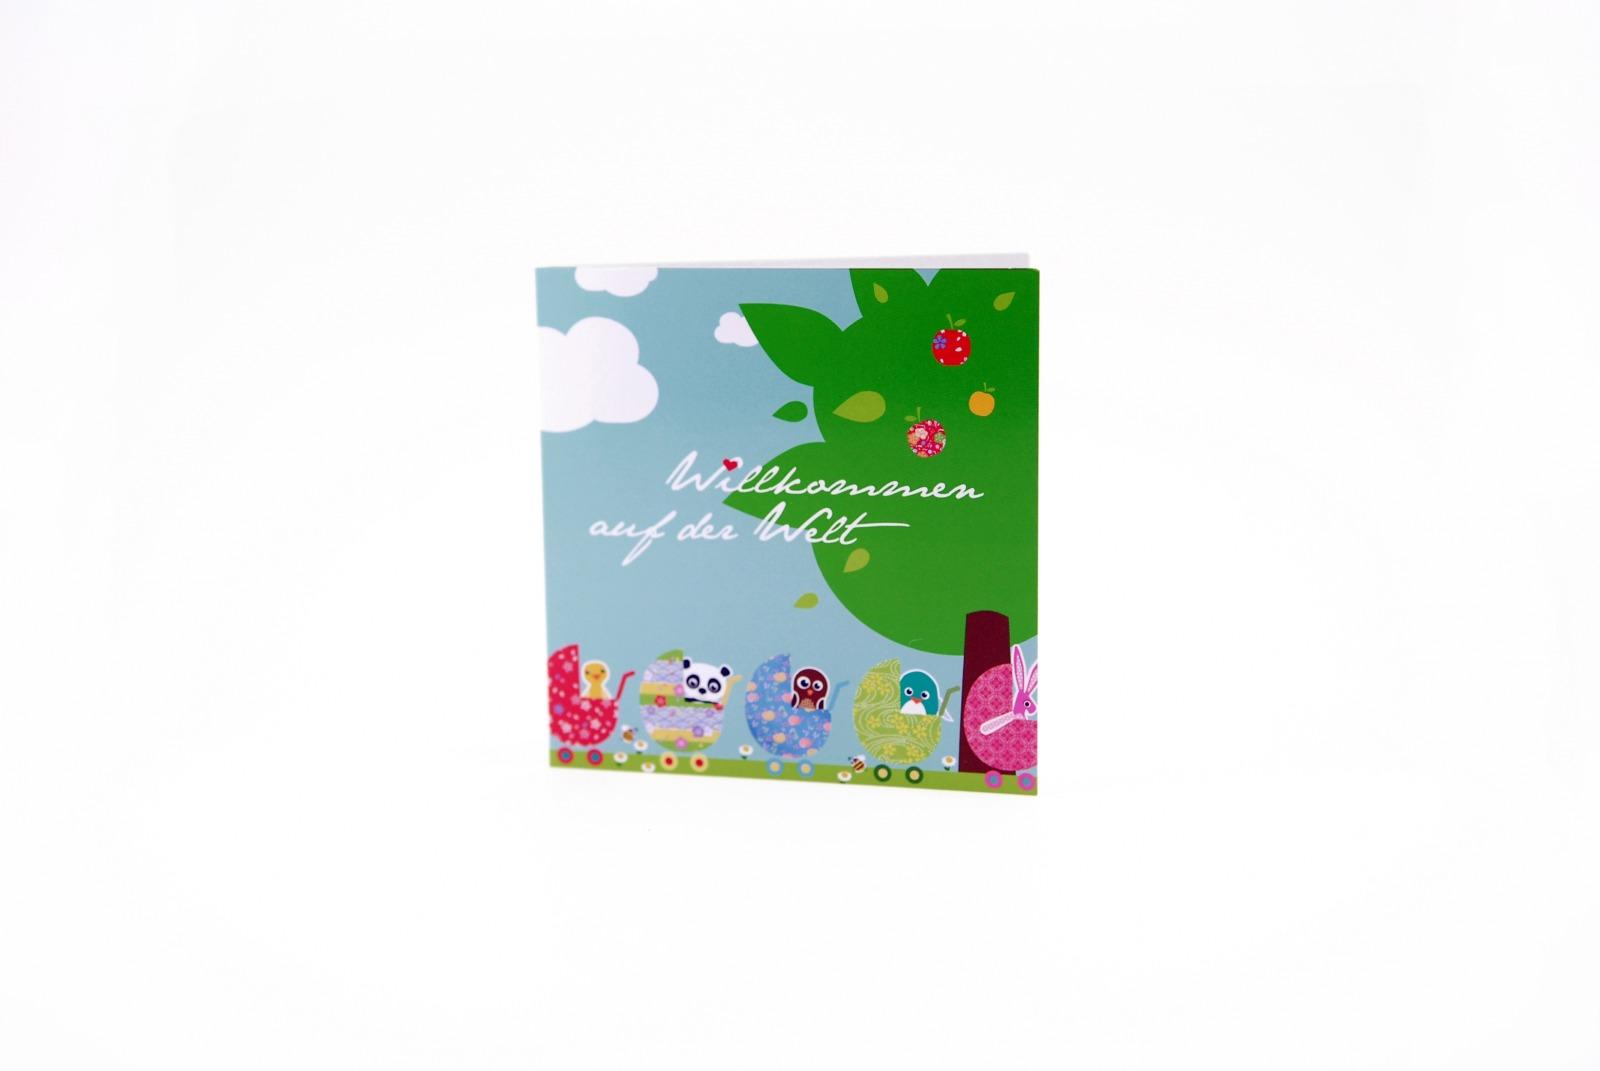 Grusskarte zur Geburt Klappkarte Geburtskarte